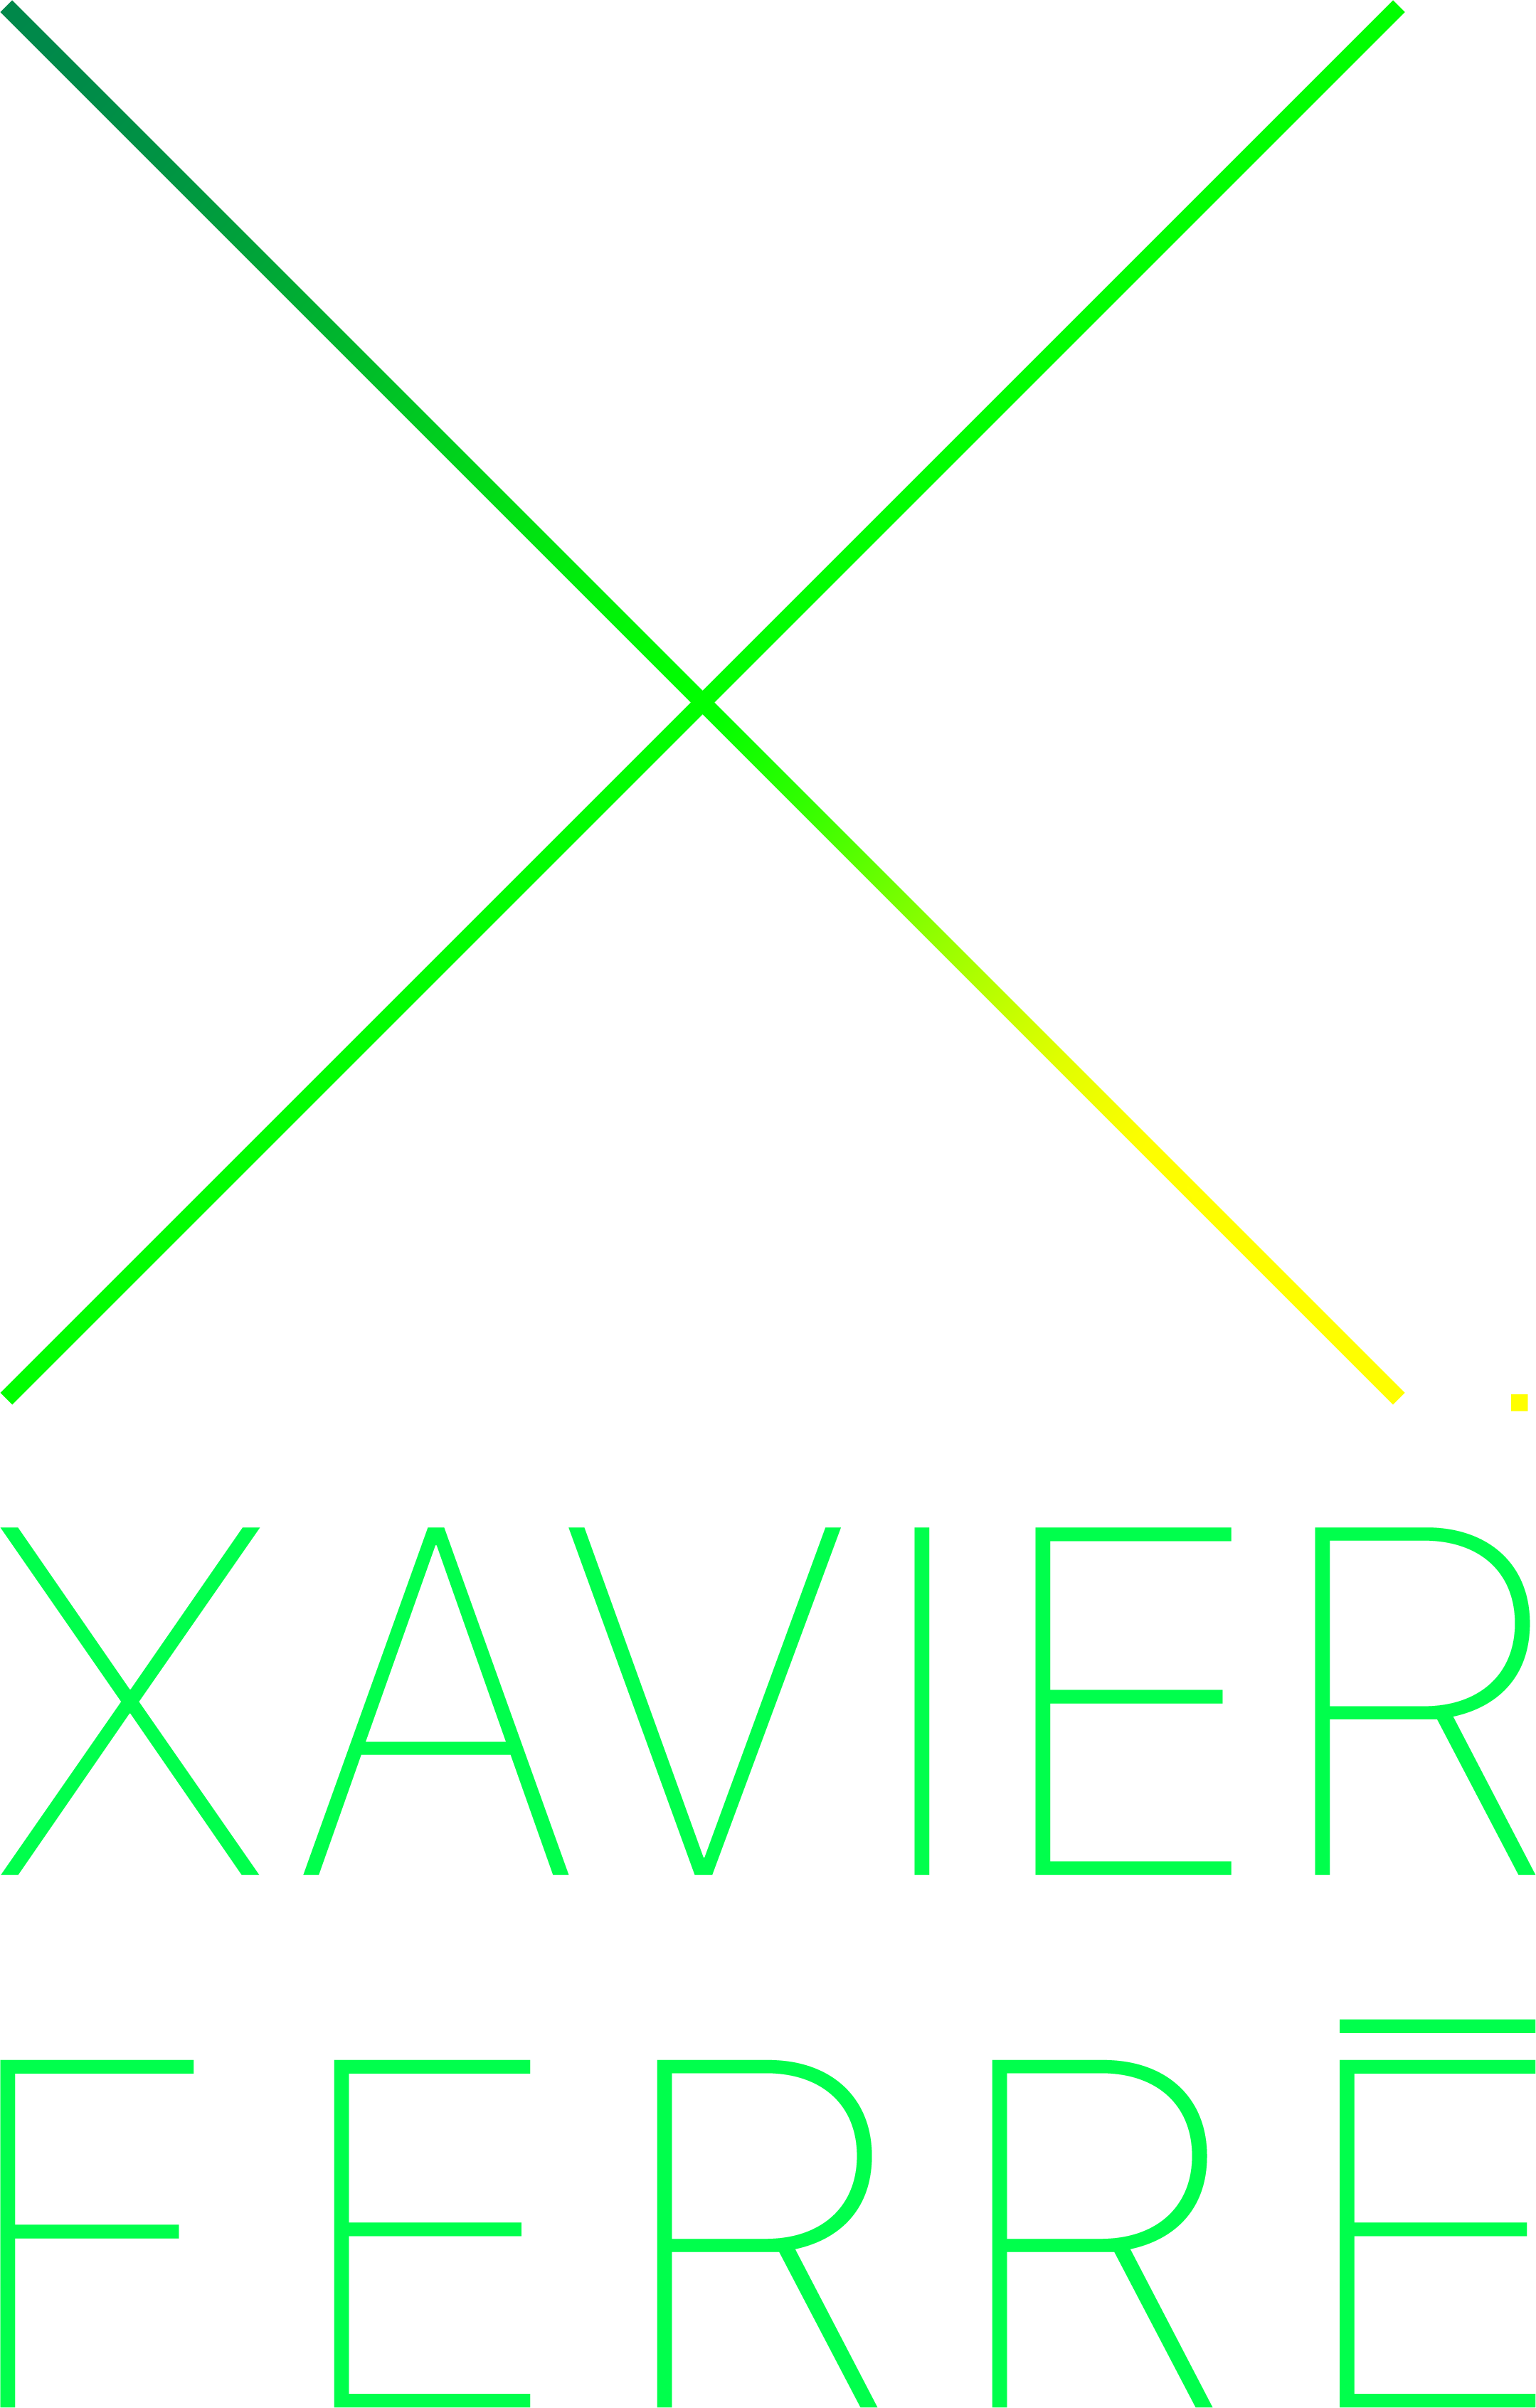 Xavier Ferre